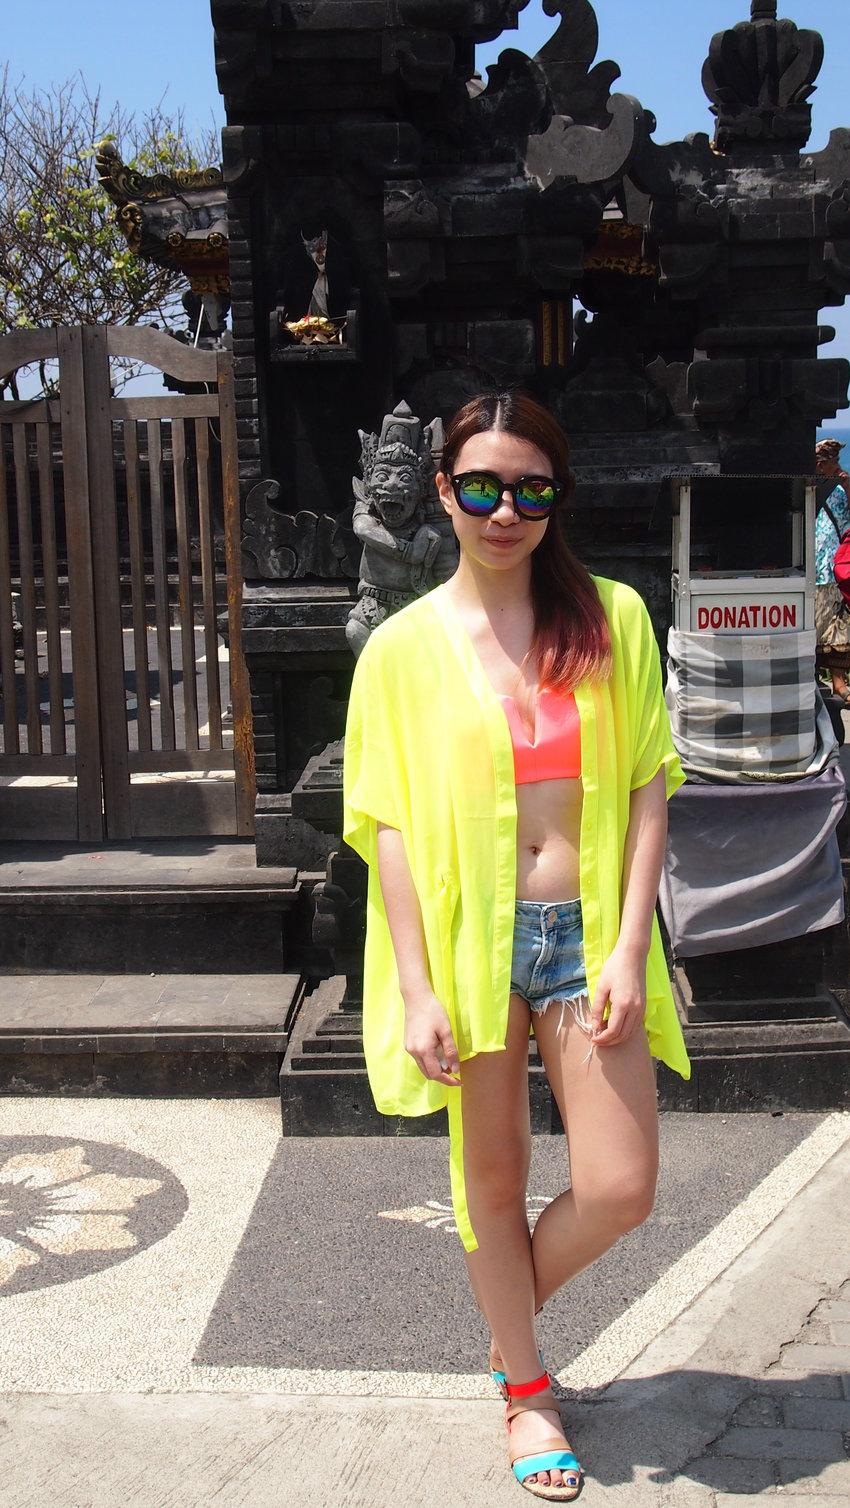 #Bali #TanahLot #TravelStyle